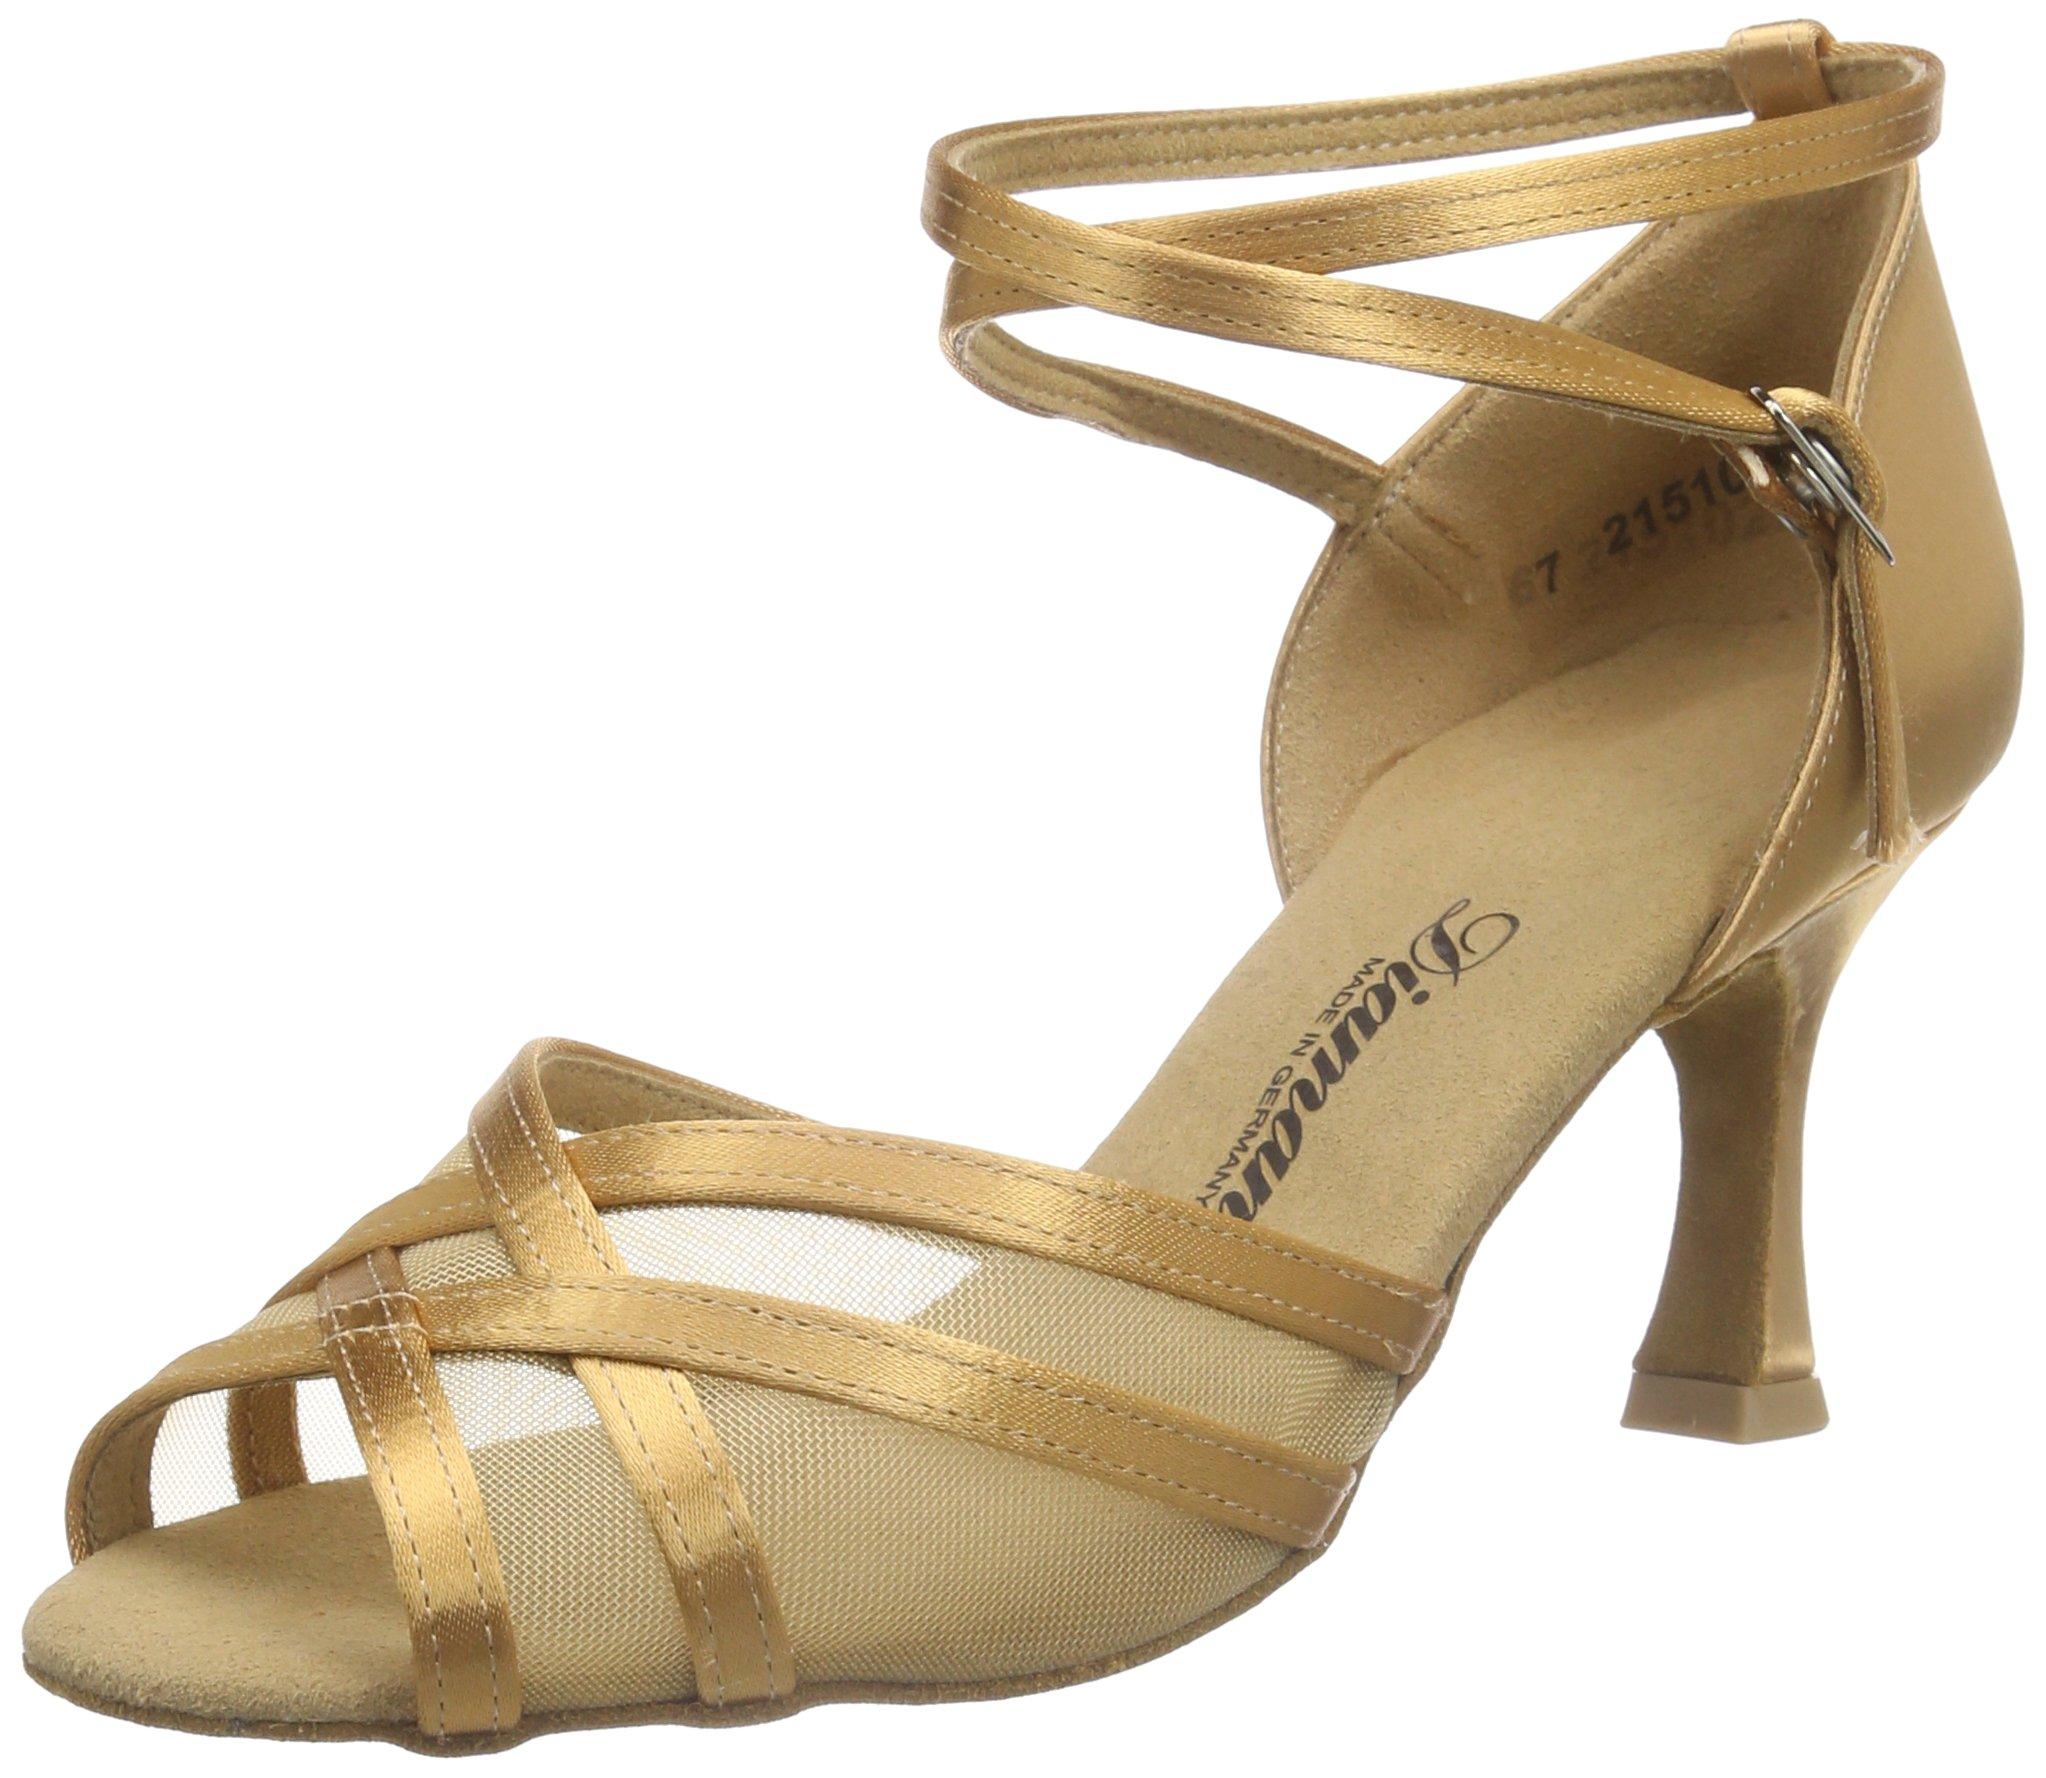 2 Tanzschuhe Danse Damen 3 De Eu Latein Salon 035 FemmesBeigehautfarben36 Diamant 087 087Chaussures 54AqR3jL